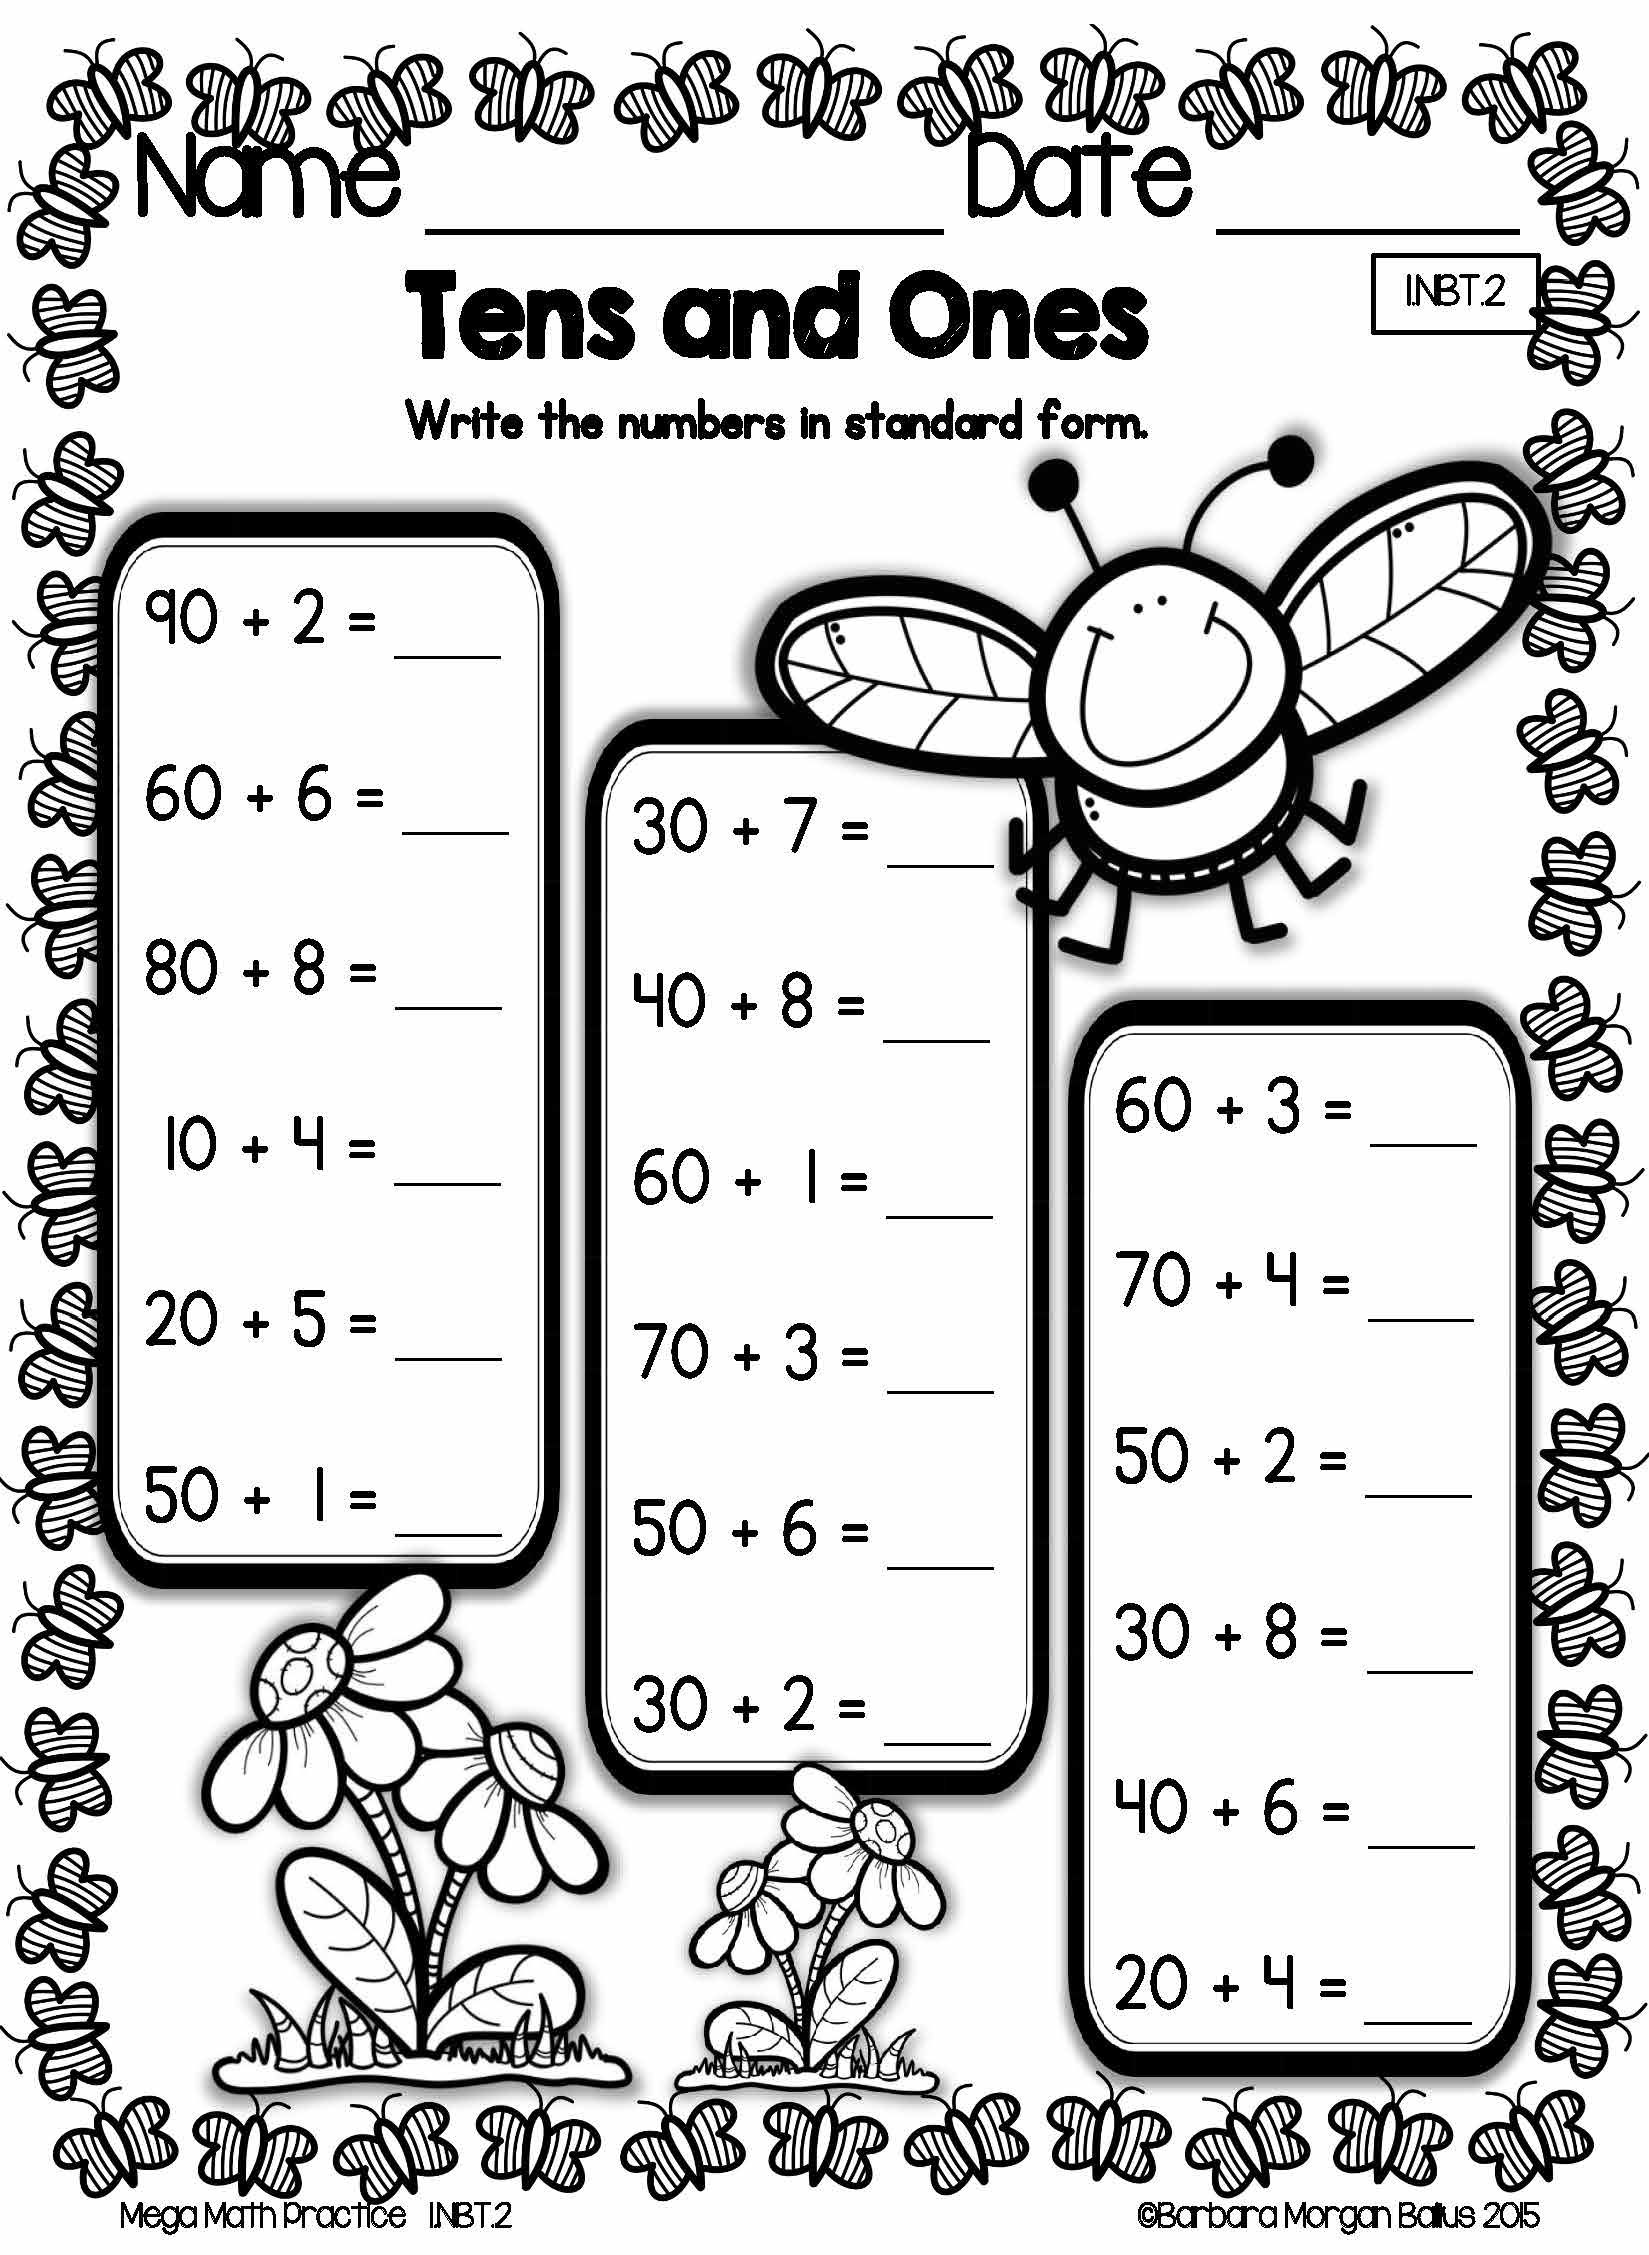 Understanding Place Value Mega Math Practice Spring 1 Nbt 2 First Grade